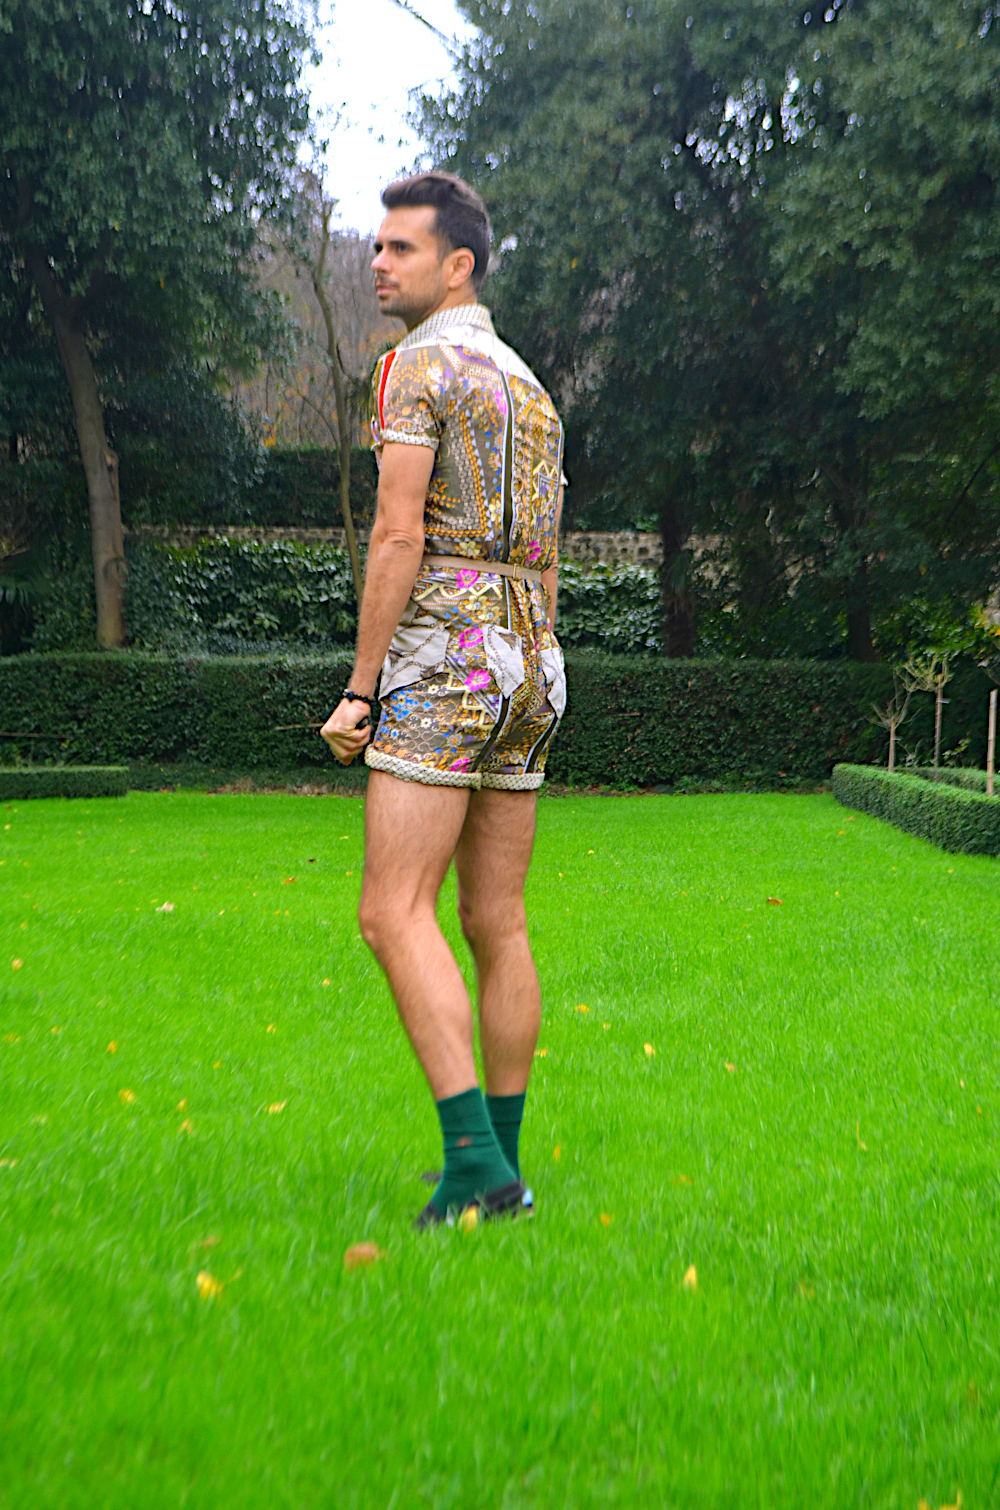 Caleb Garcia Taylor lounging in a garden in his bamboo silk jumper onesie design.